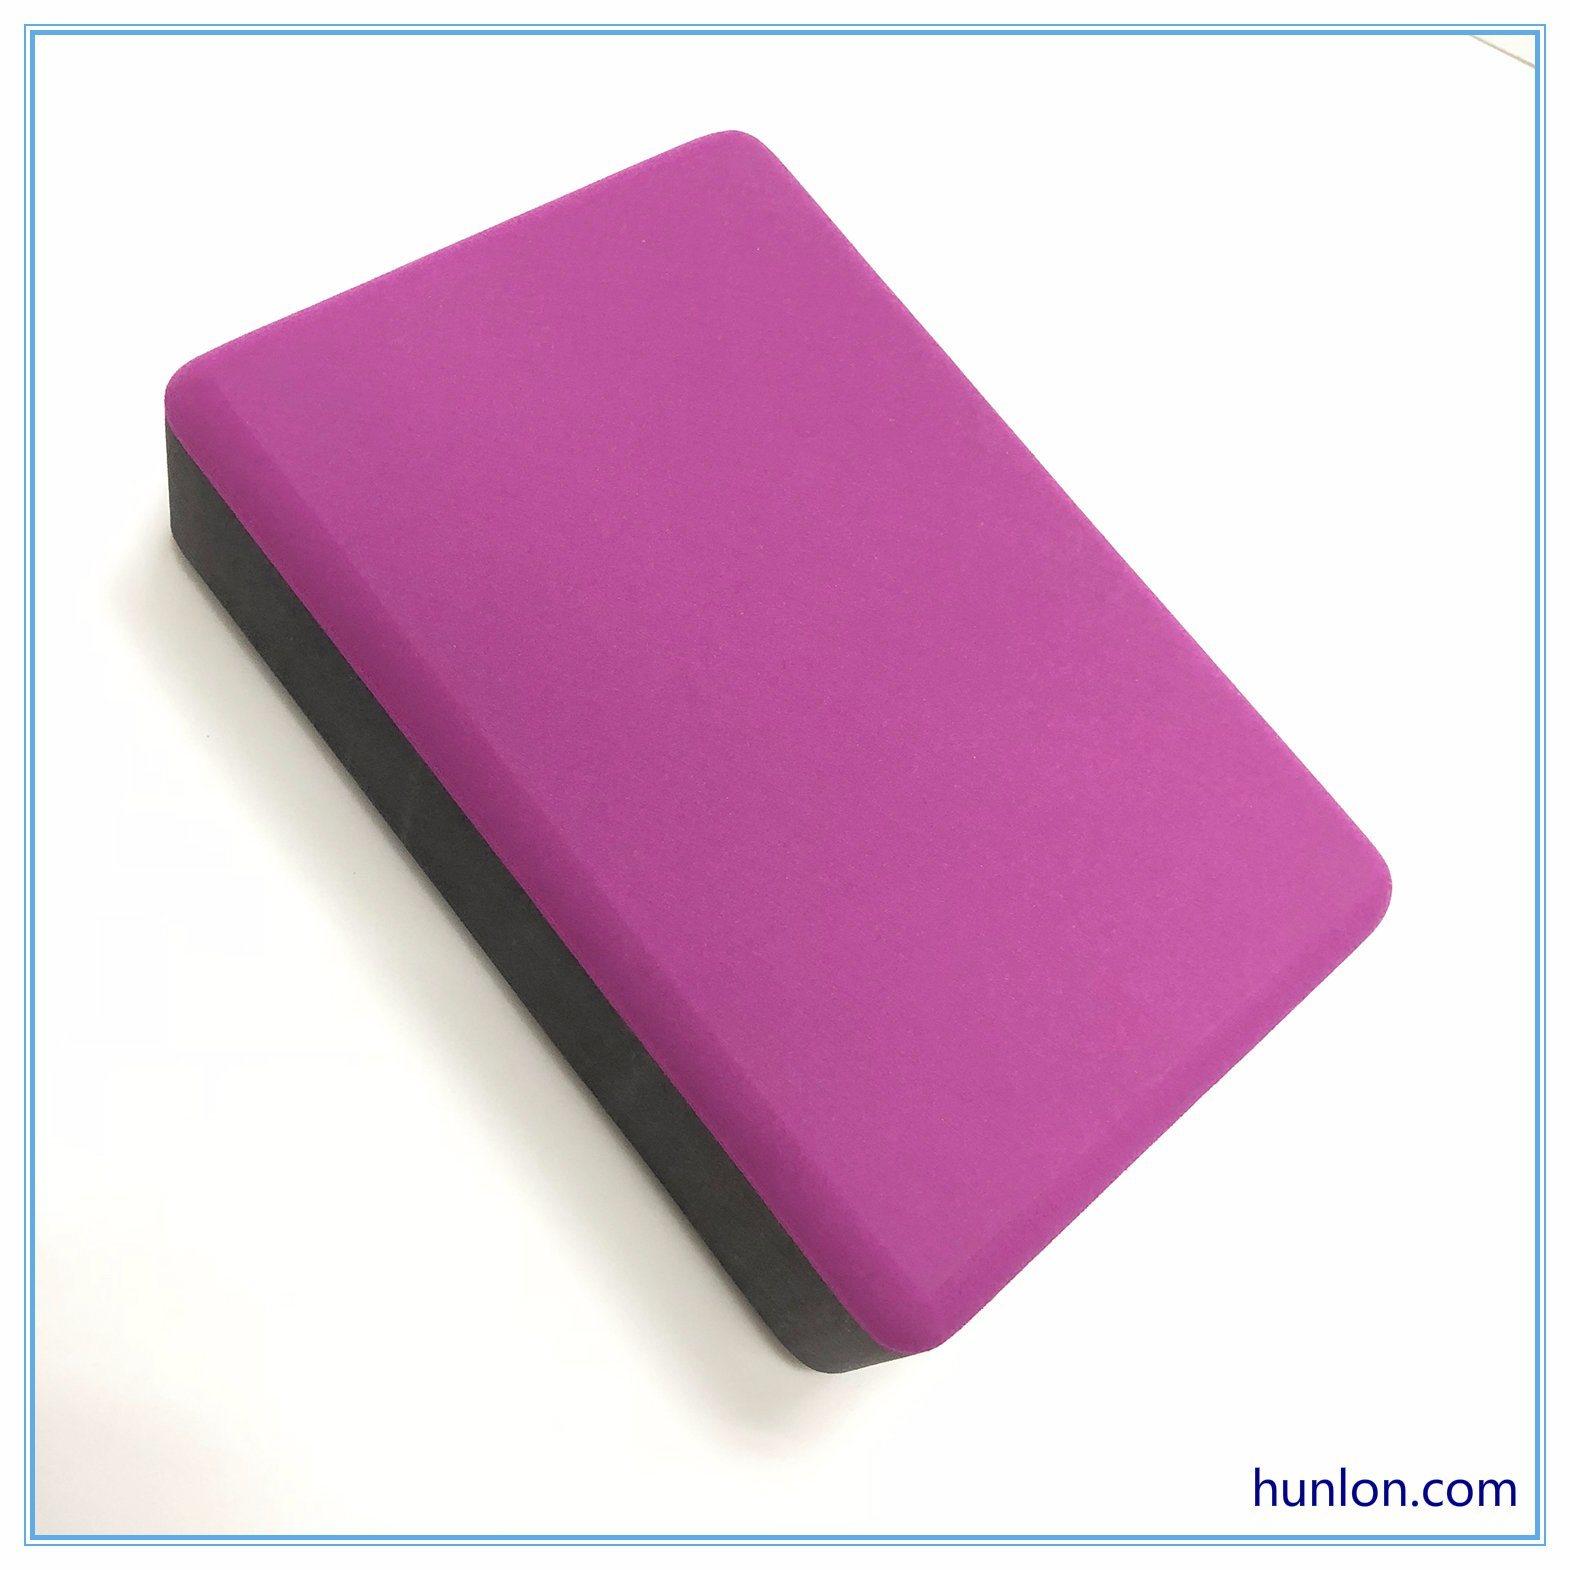 a8dcd0f91e7 De gama alta Pilates Yoga bloques de espuma Eco – De gama alta Pilates Yoga  bloques de espuma Eco proporcionado por Dongguan Hunlon Rubber   Plastic  Co.